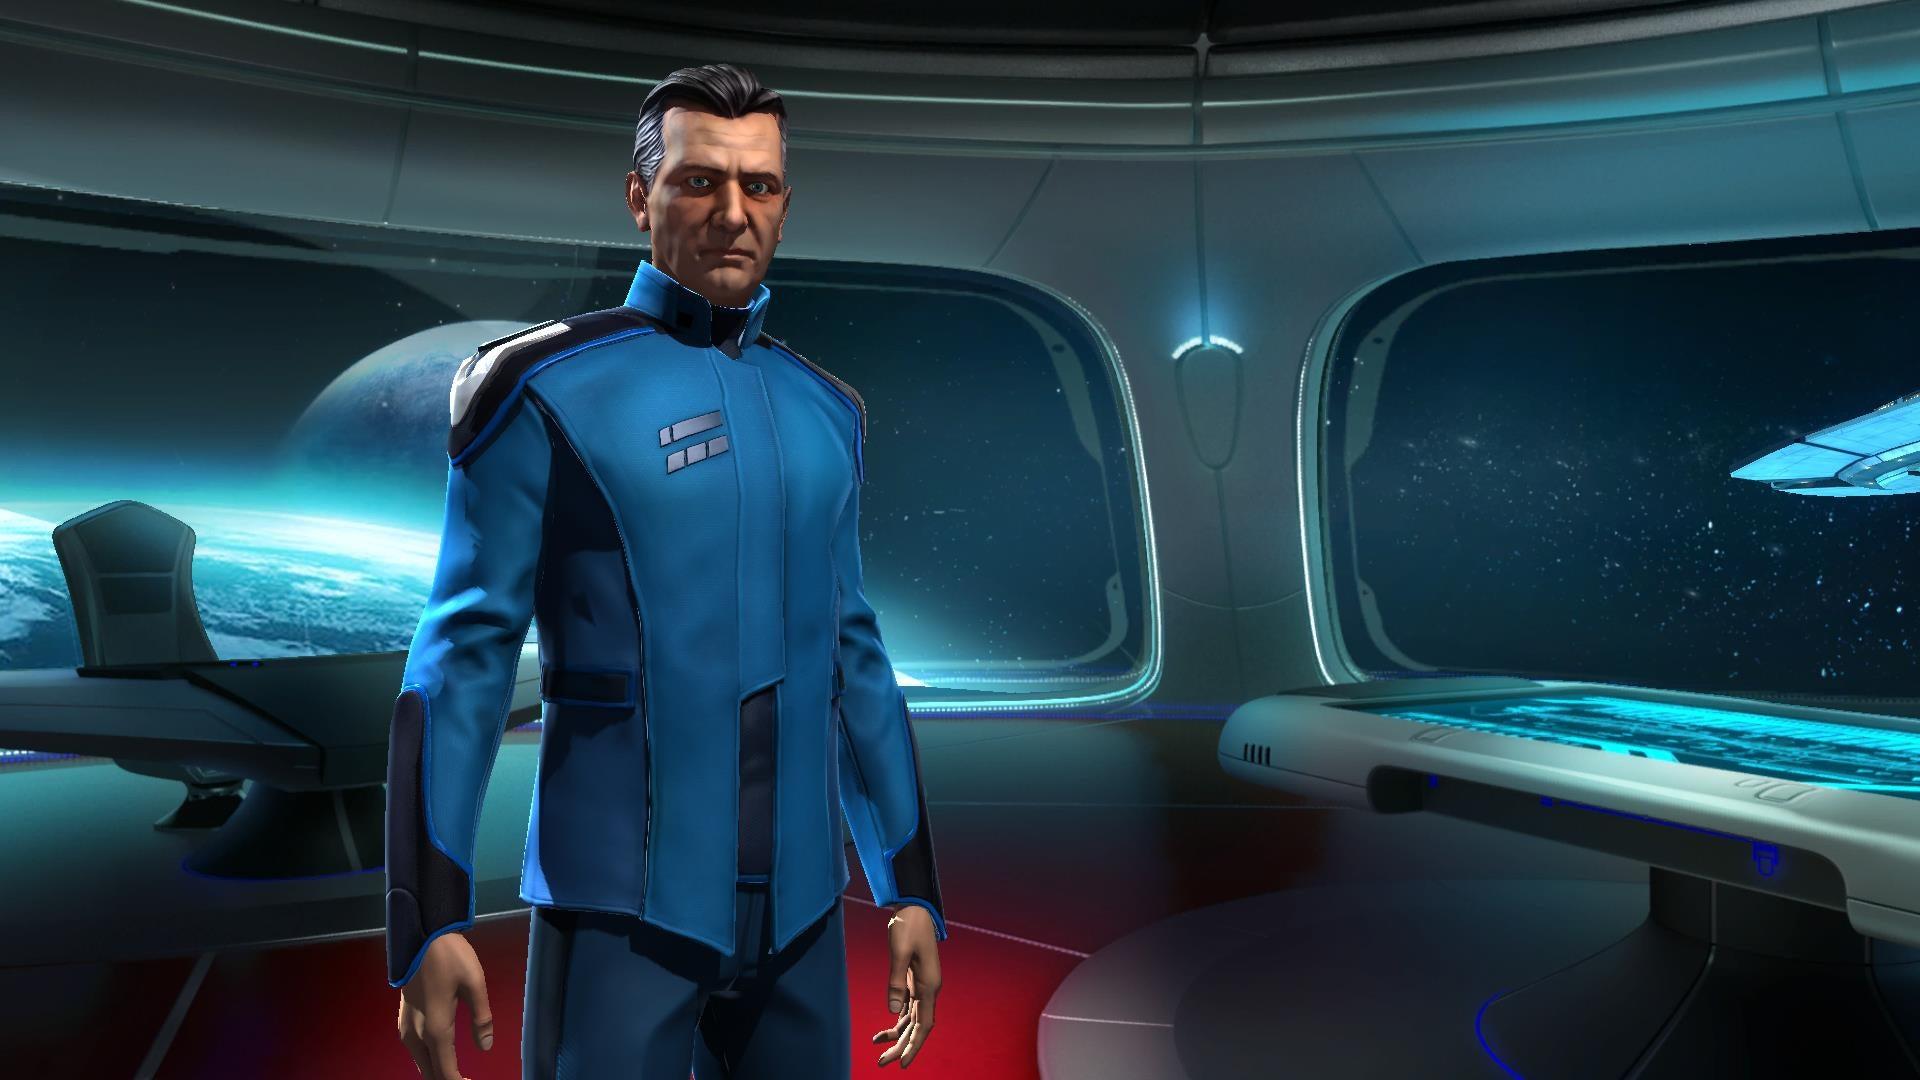 Image for Master of Orion voice cast includes Mark Hamill, Alan Tudyk, John de Lancie, more